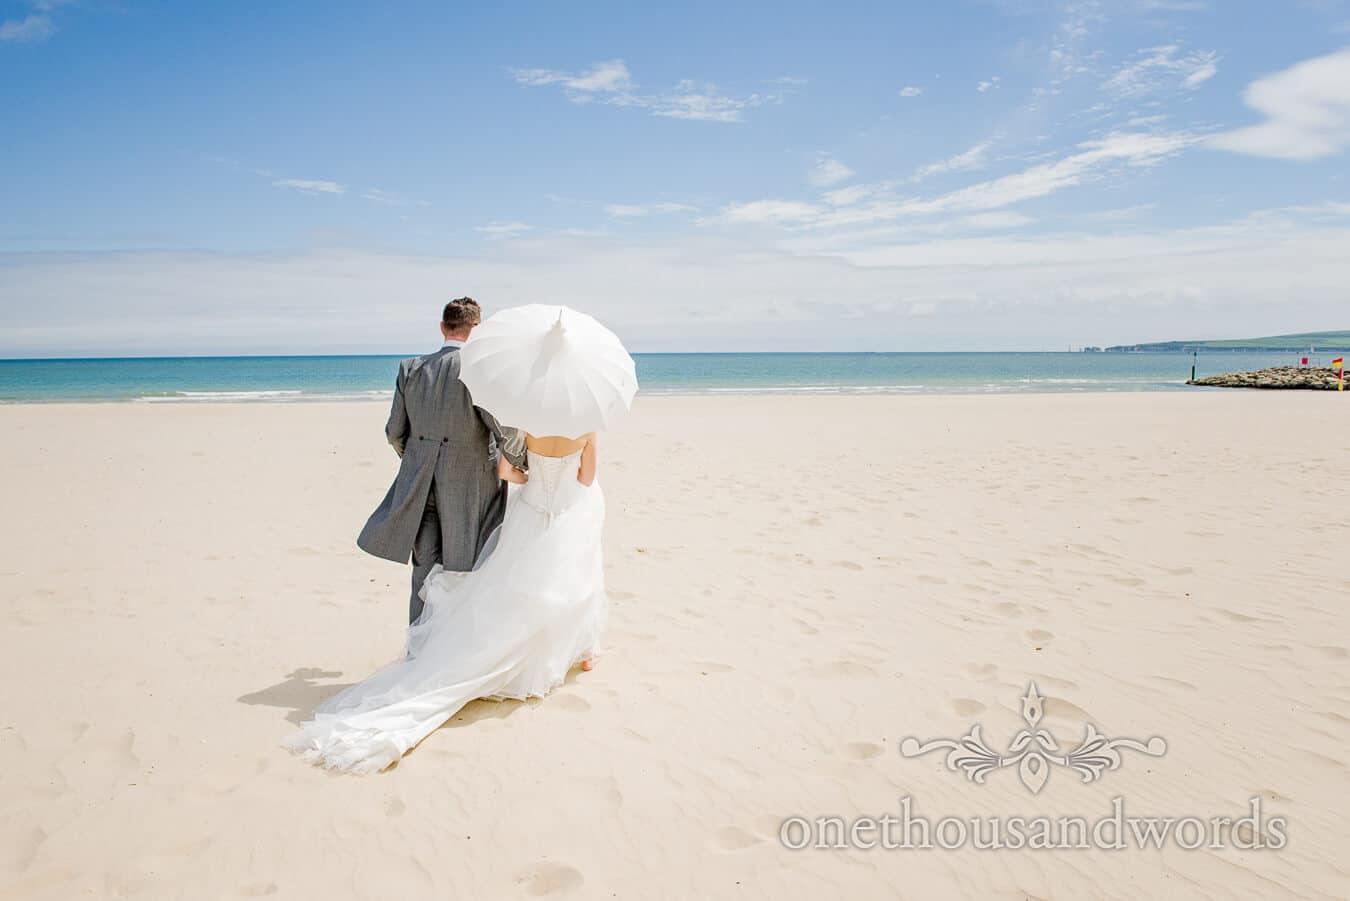 Bride and groom on white sand beach at Sandbanks Beach summer sun